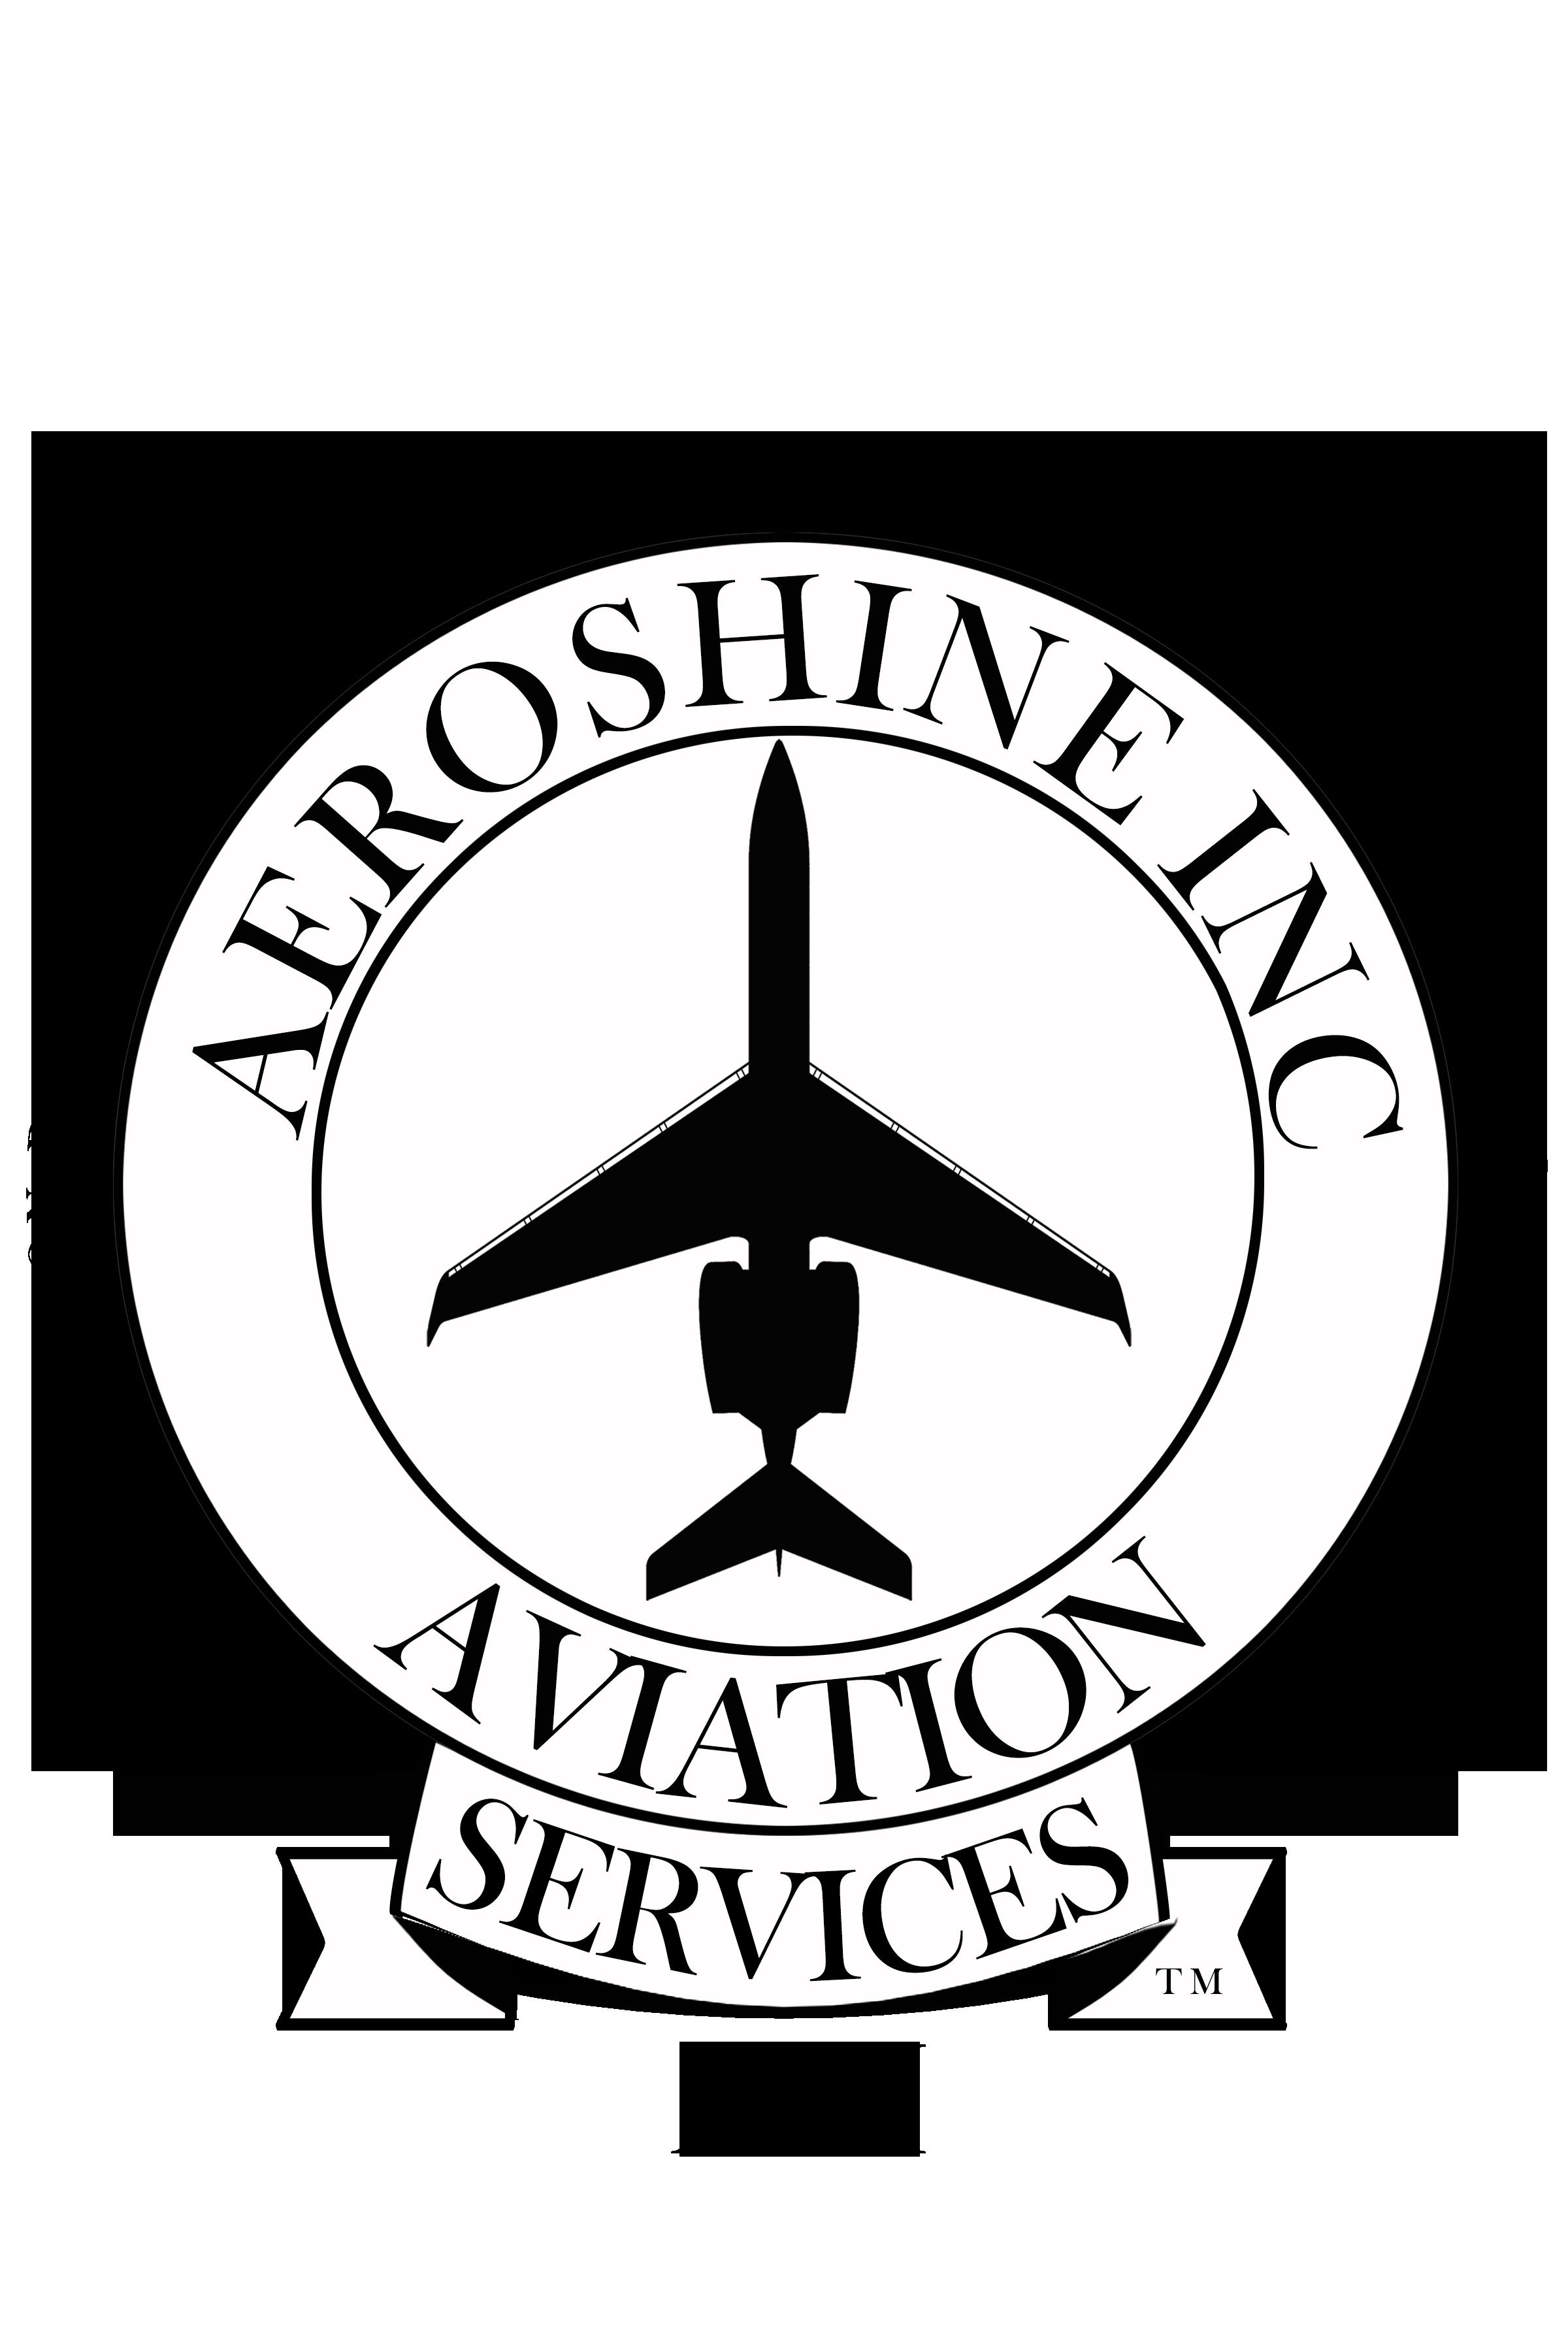 New AeroShine Logo with TM.png